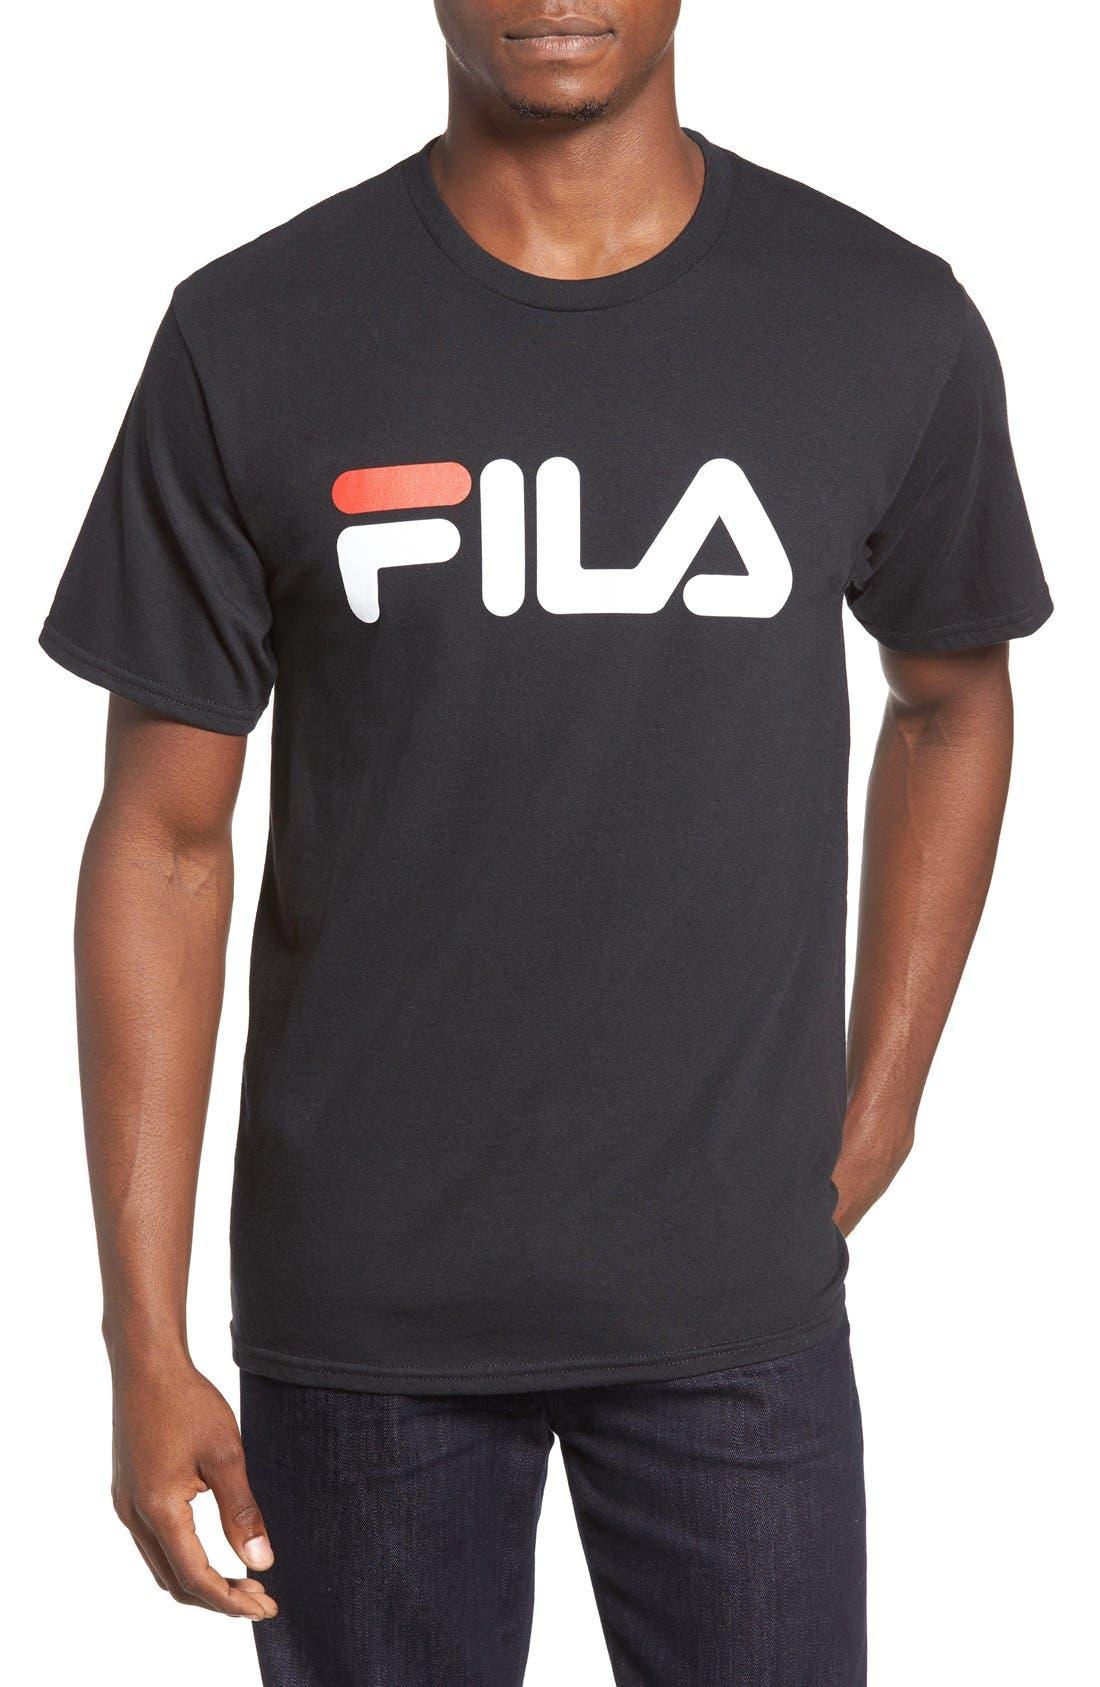 USA Graphic T-Shirt,                         Main,                         color, Black